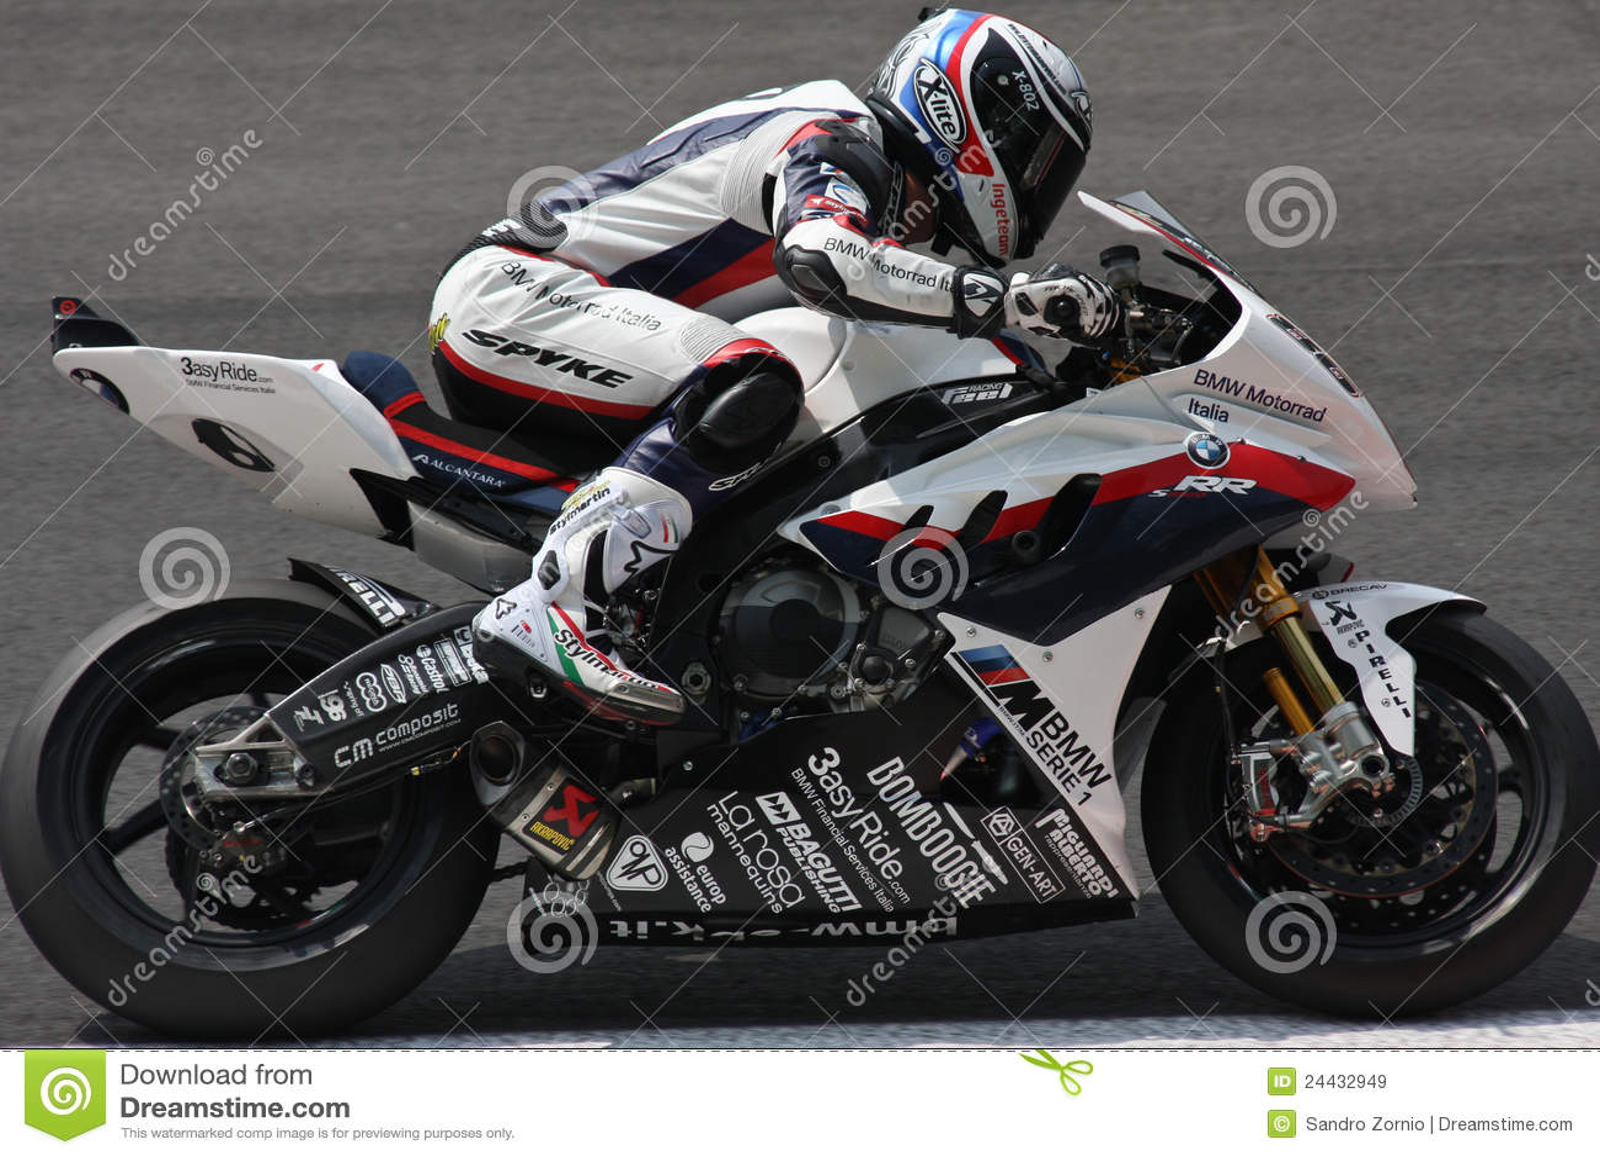 Troy Corser BMW S1000 RR - BMW Motorrad Motorsport